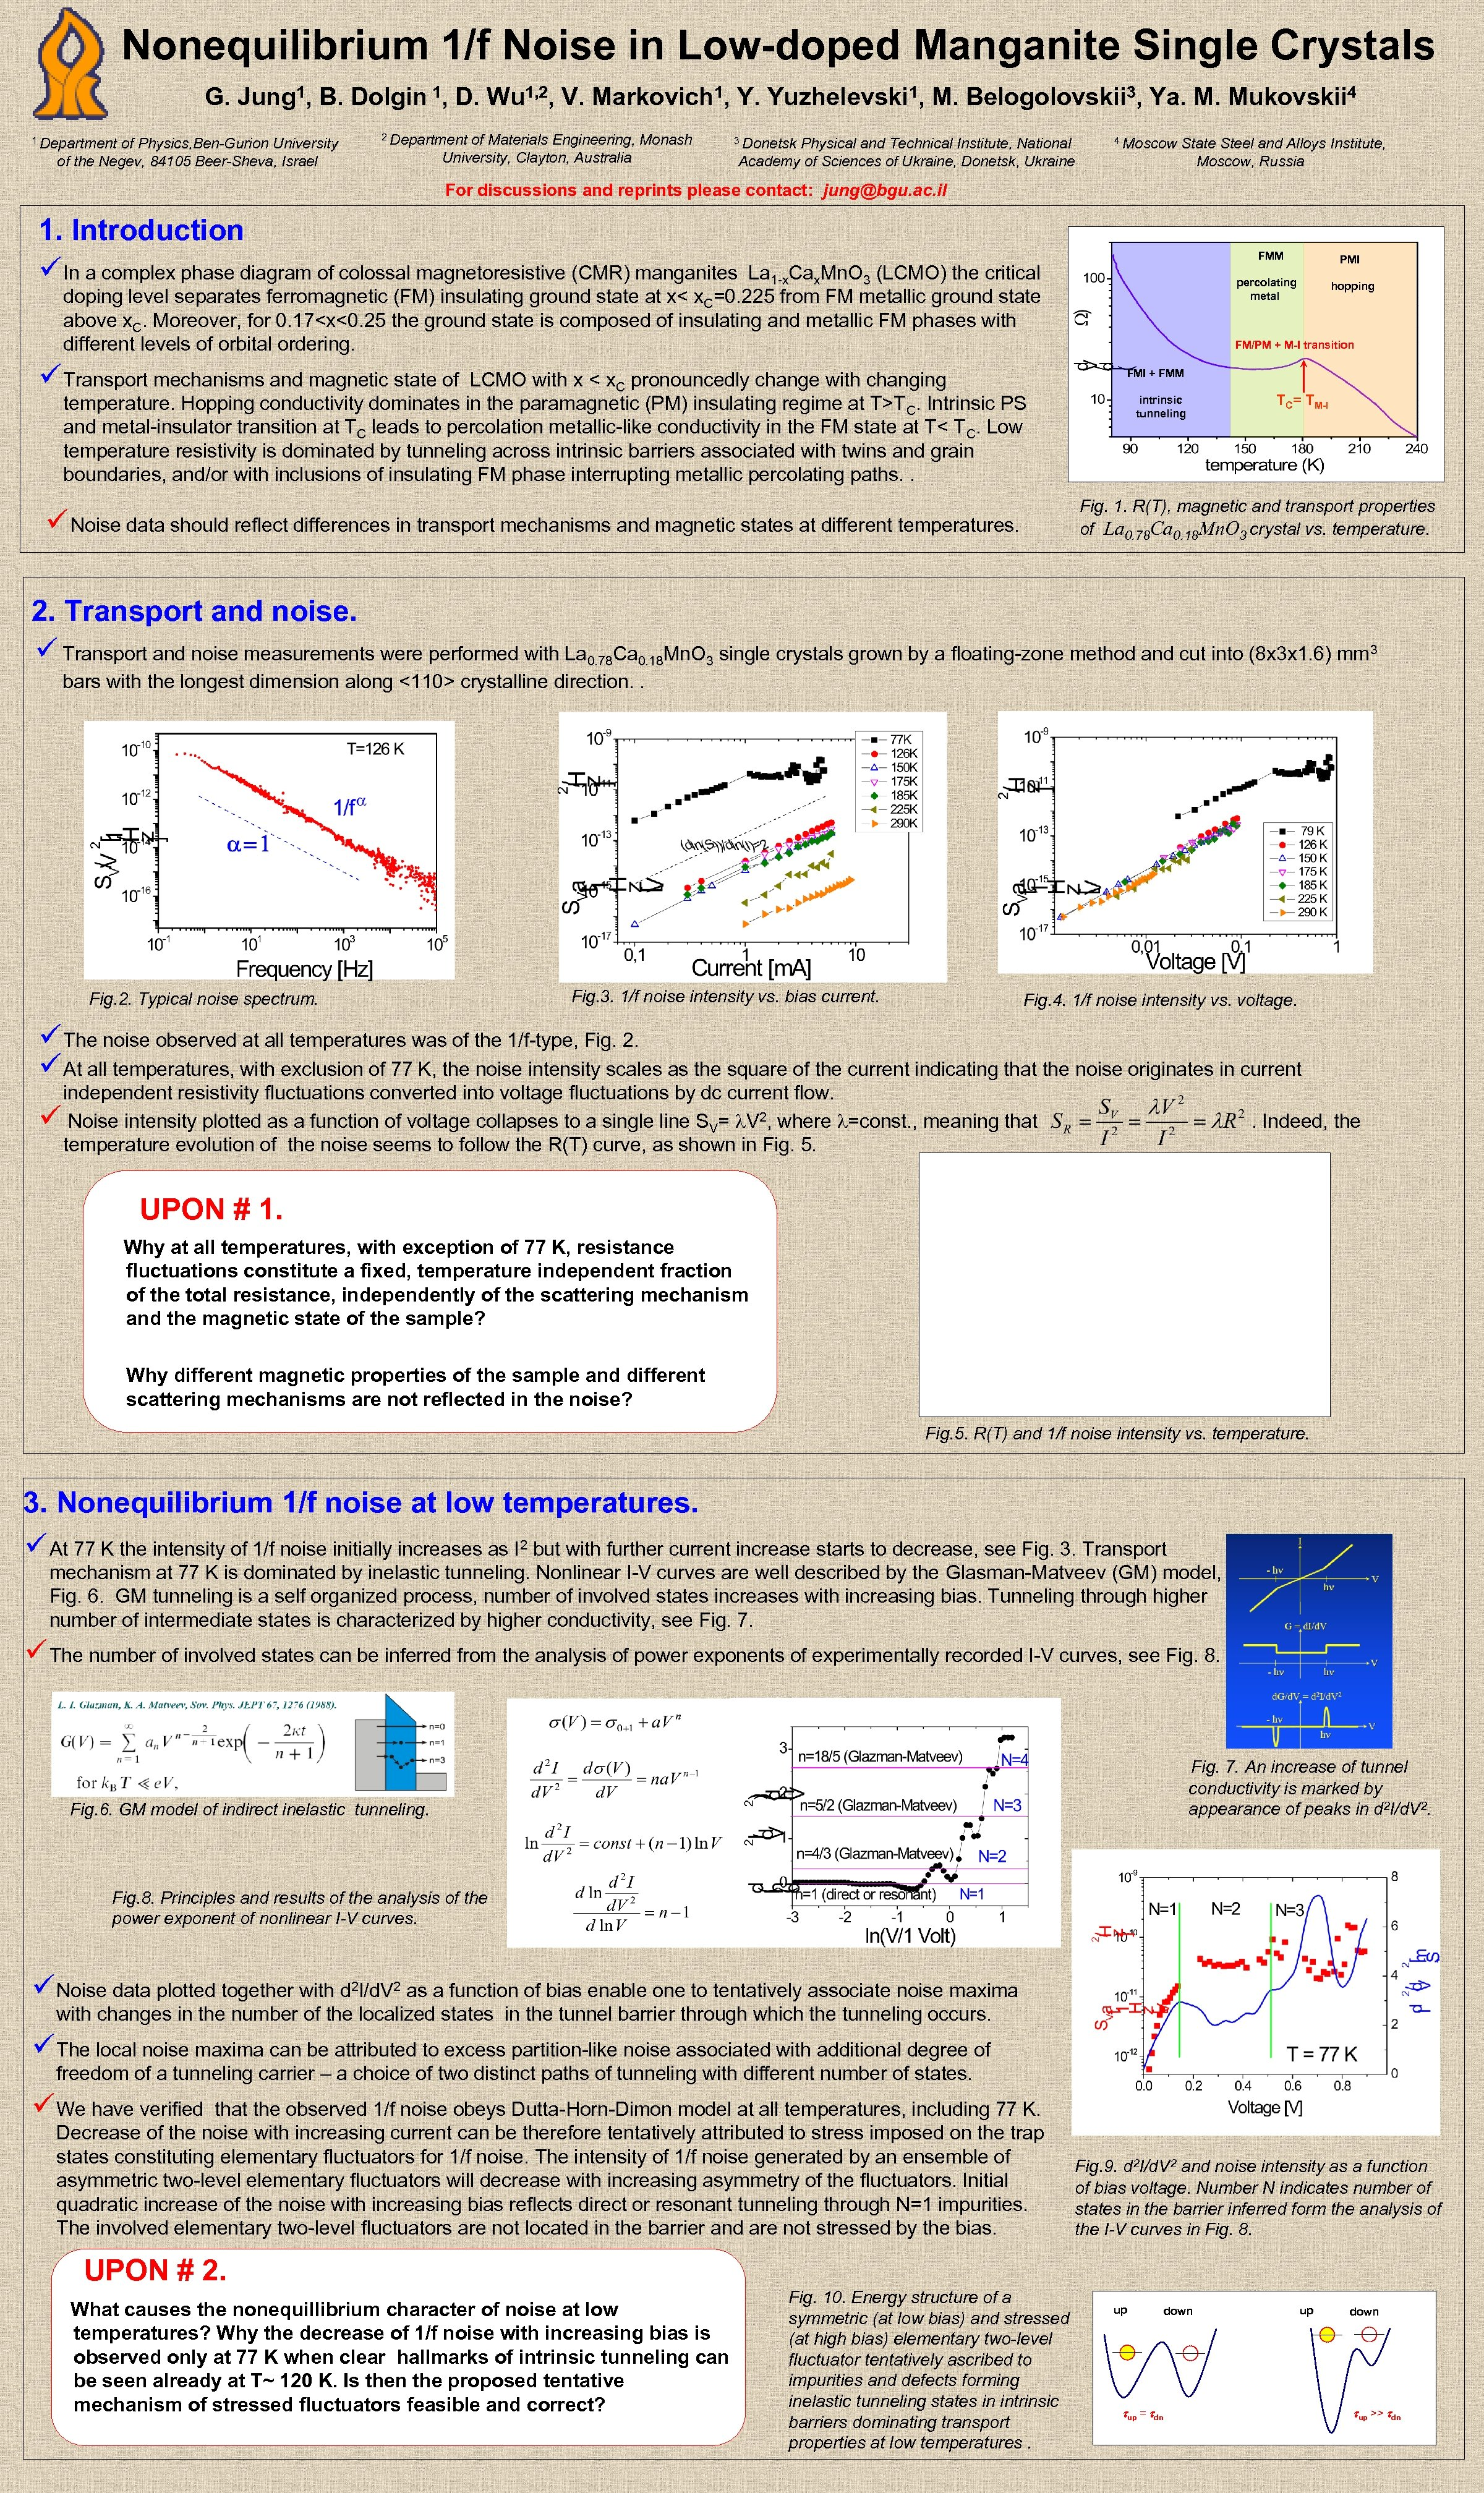 Nonequilibrium 1/f Noise in Low-doped Manganite Single Crystals G. Jung 1, B. Dolgin 1,